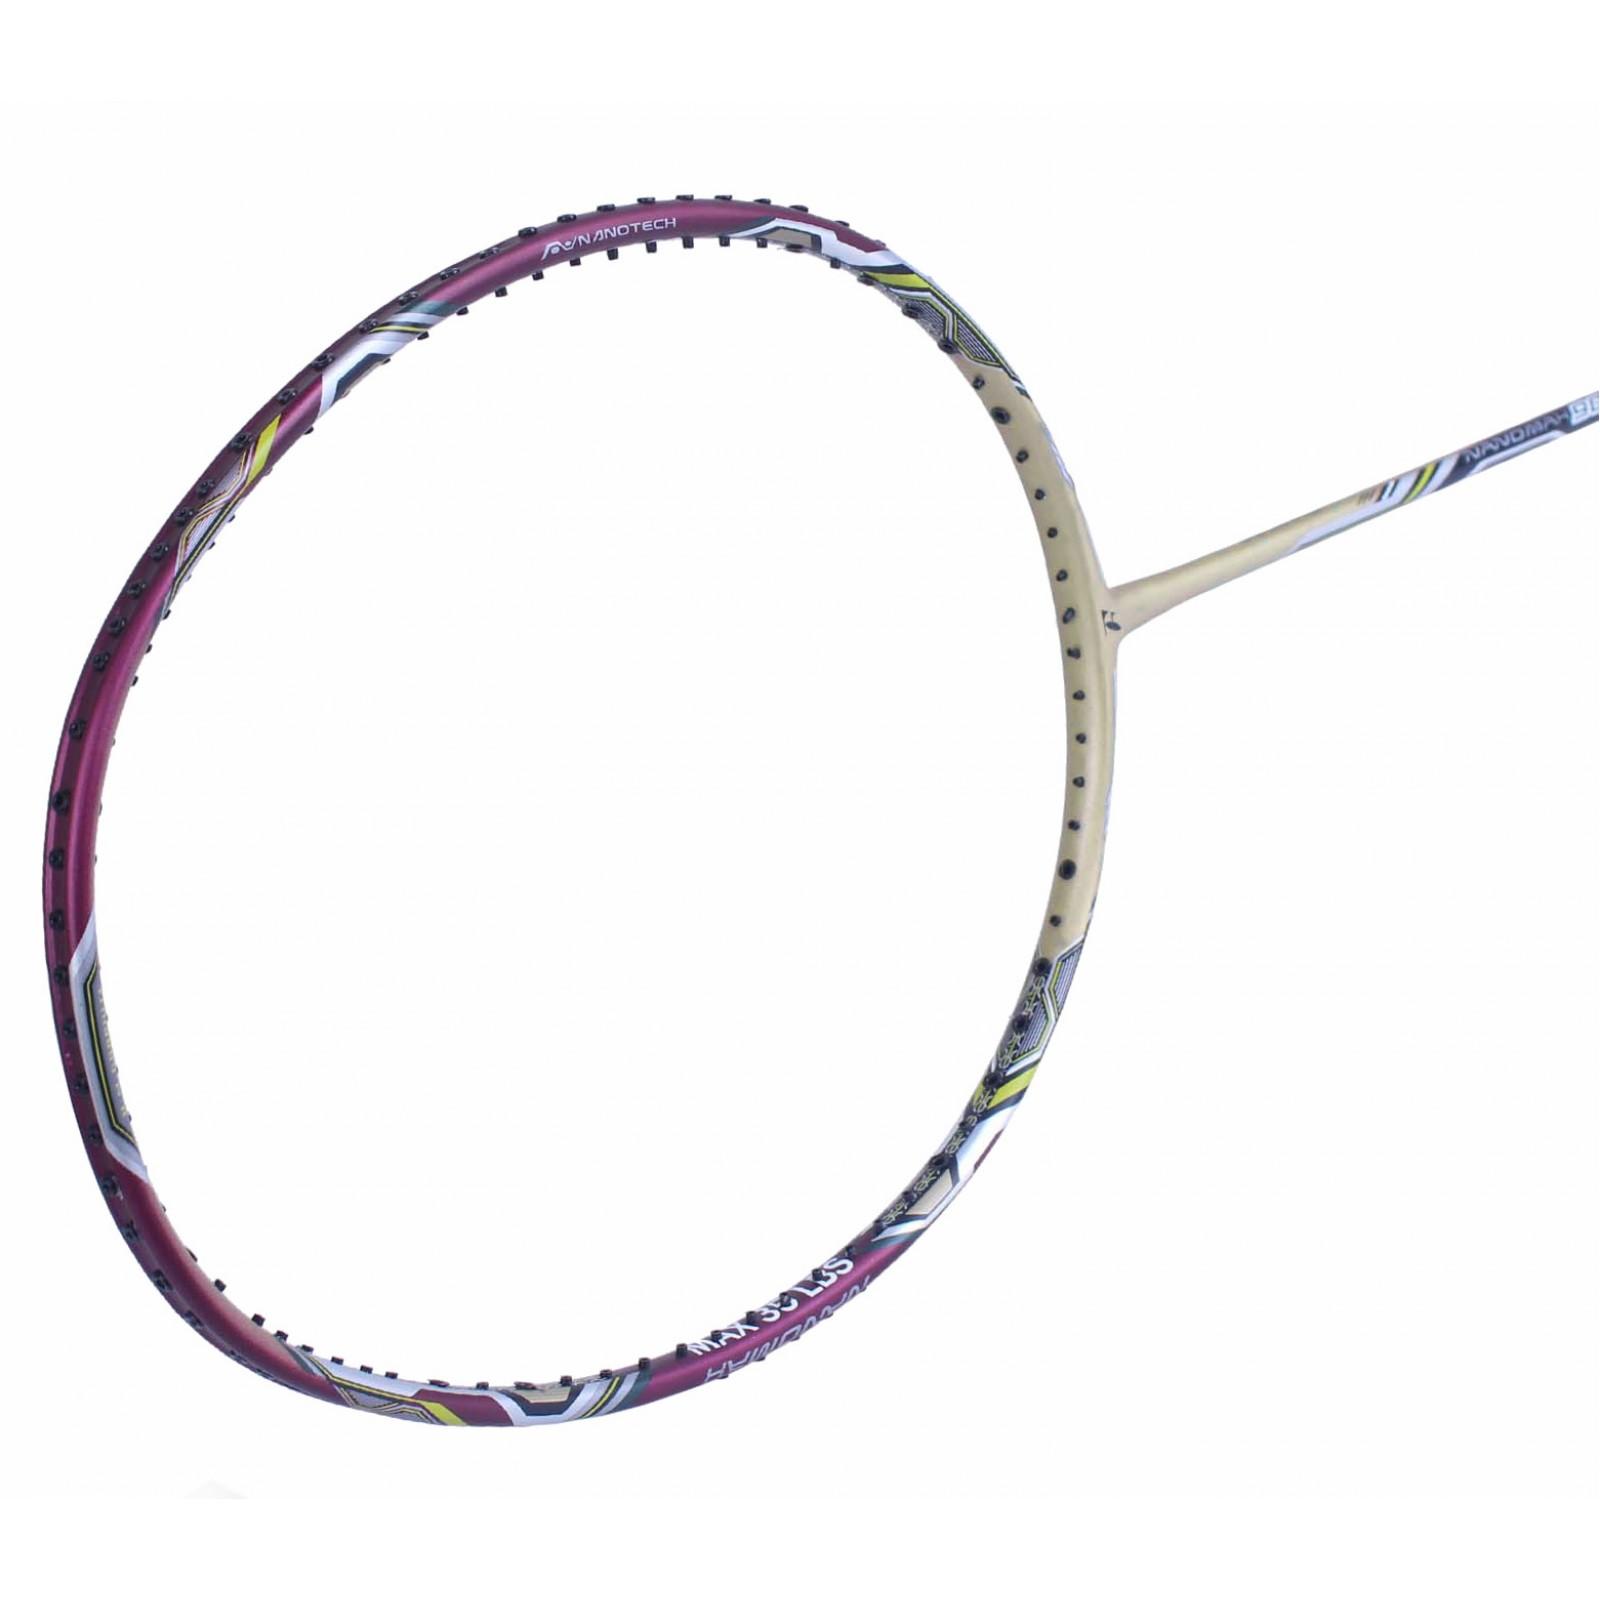 ~ Out of stock Fleet NanoMax 900 Gold Purple Badminton ...